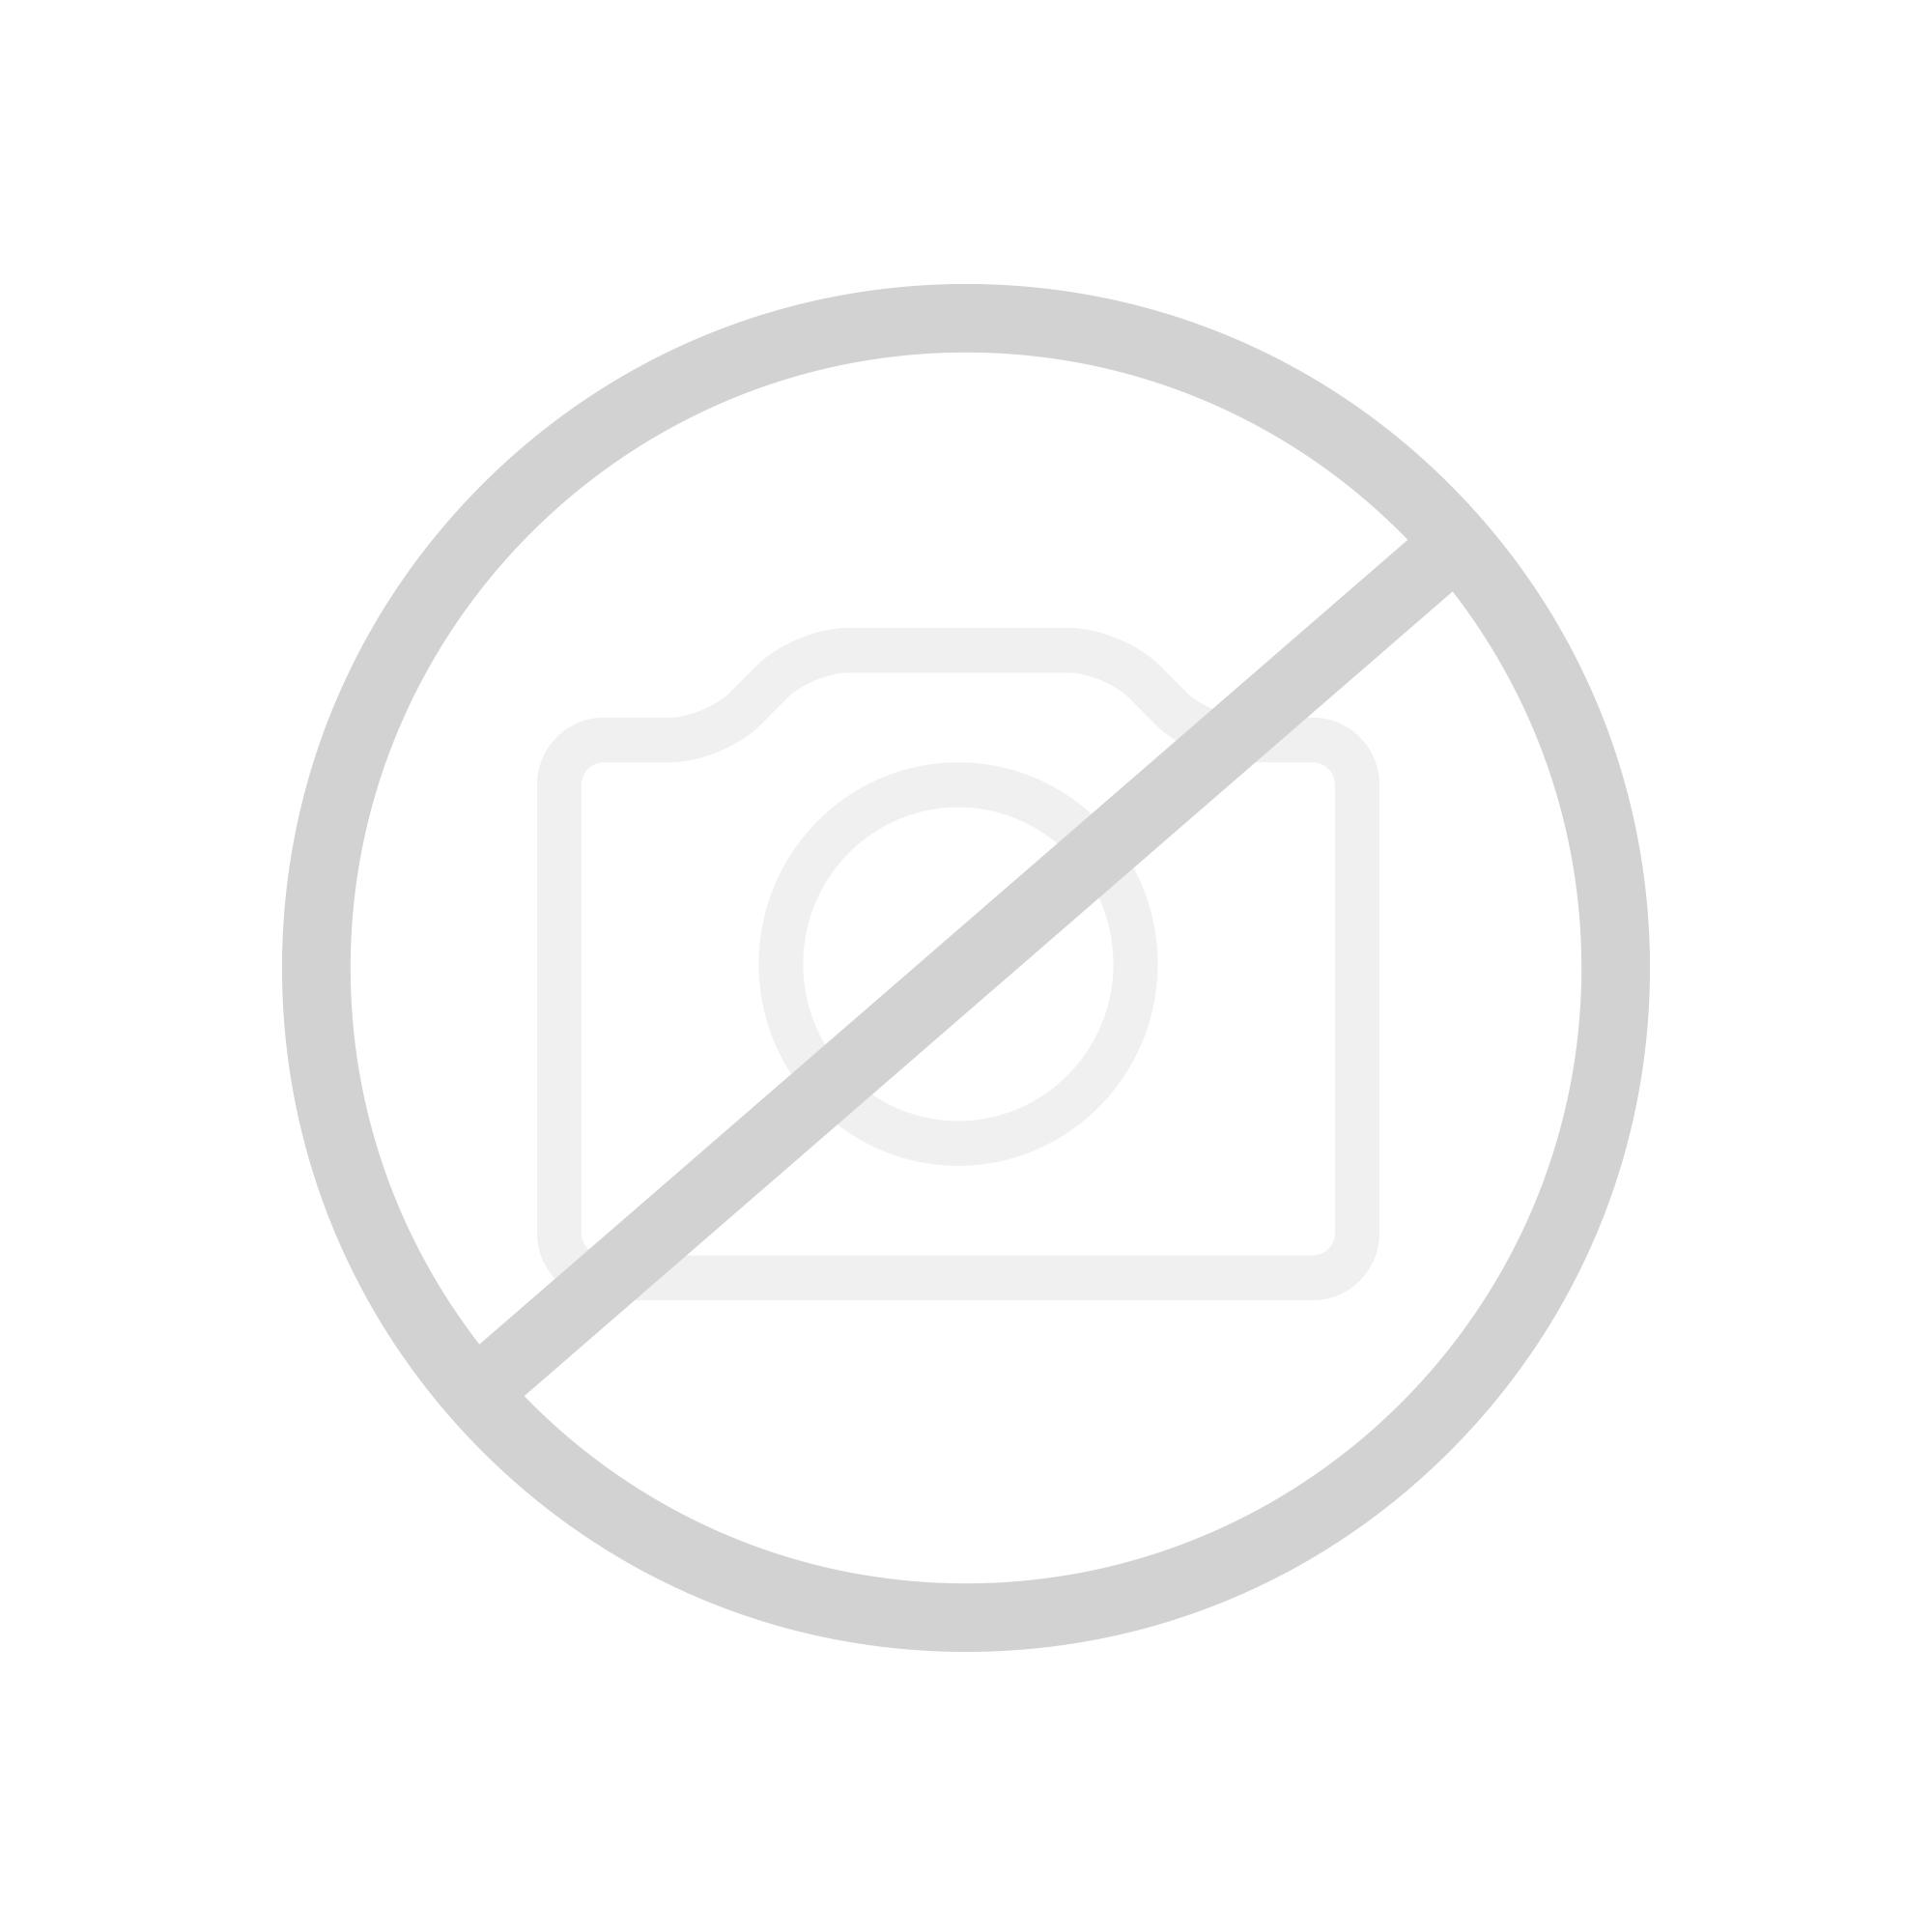 louis poulsen PH 3-2 ½ Pollerleuchte